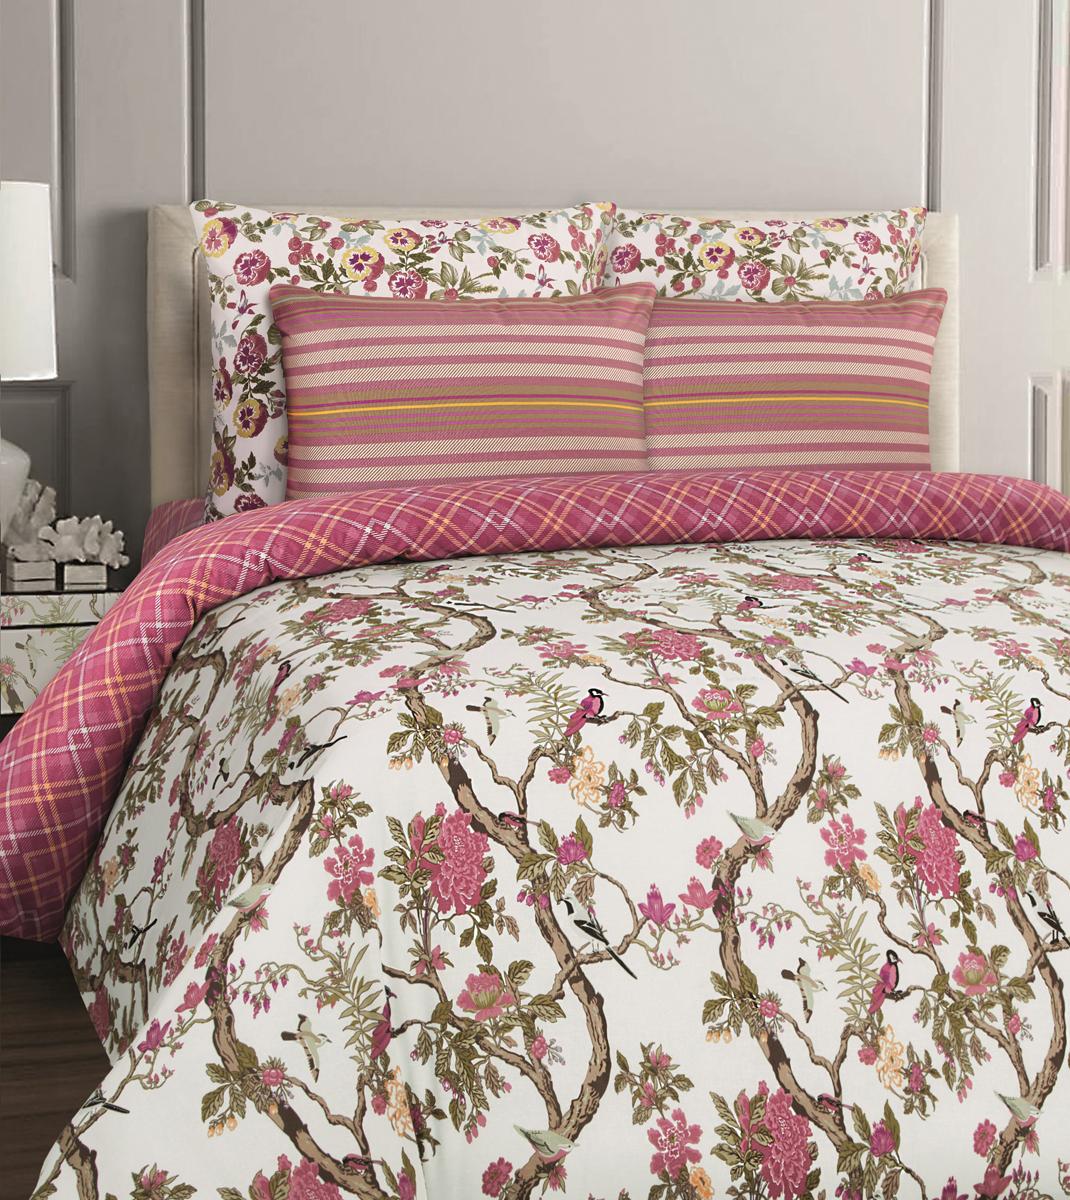 Комплект белья Mona Liza British Bristol, евро, наволочки 70x70. 552109-69 комплект белья mona liza premium atelier ikat 1 5 спальный наволочки 70x70 5047 005